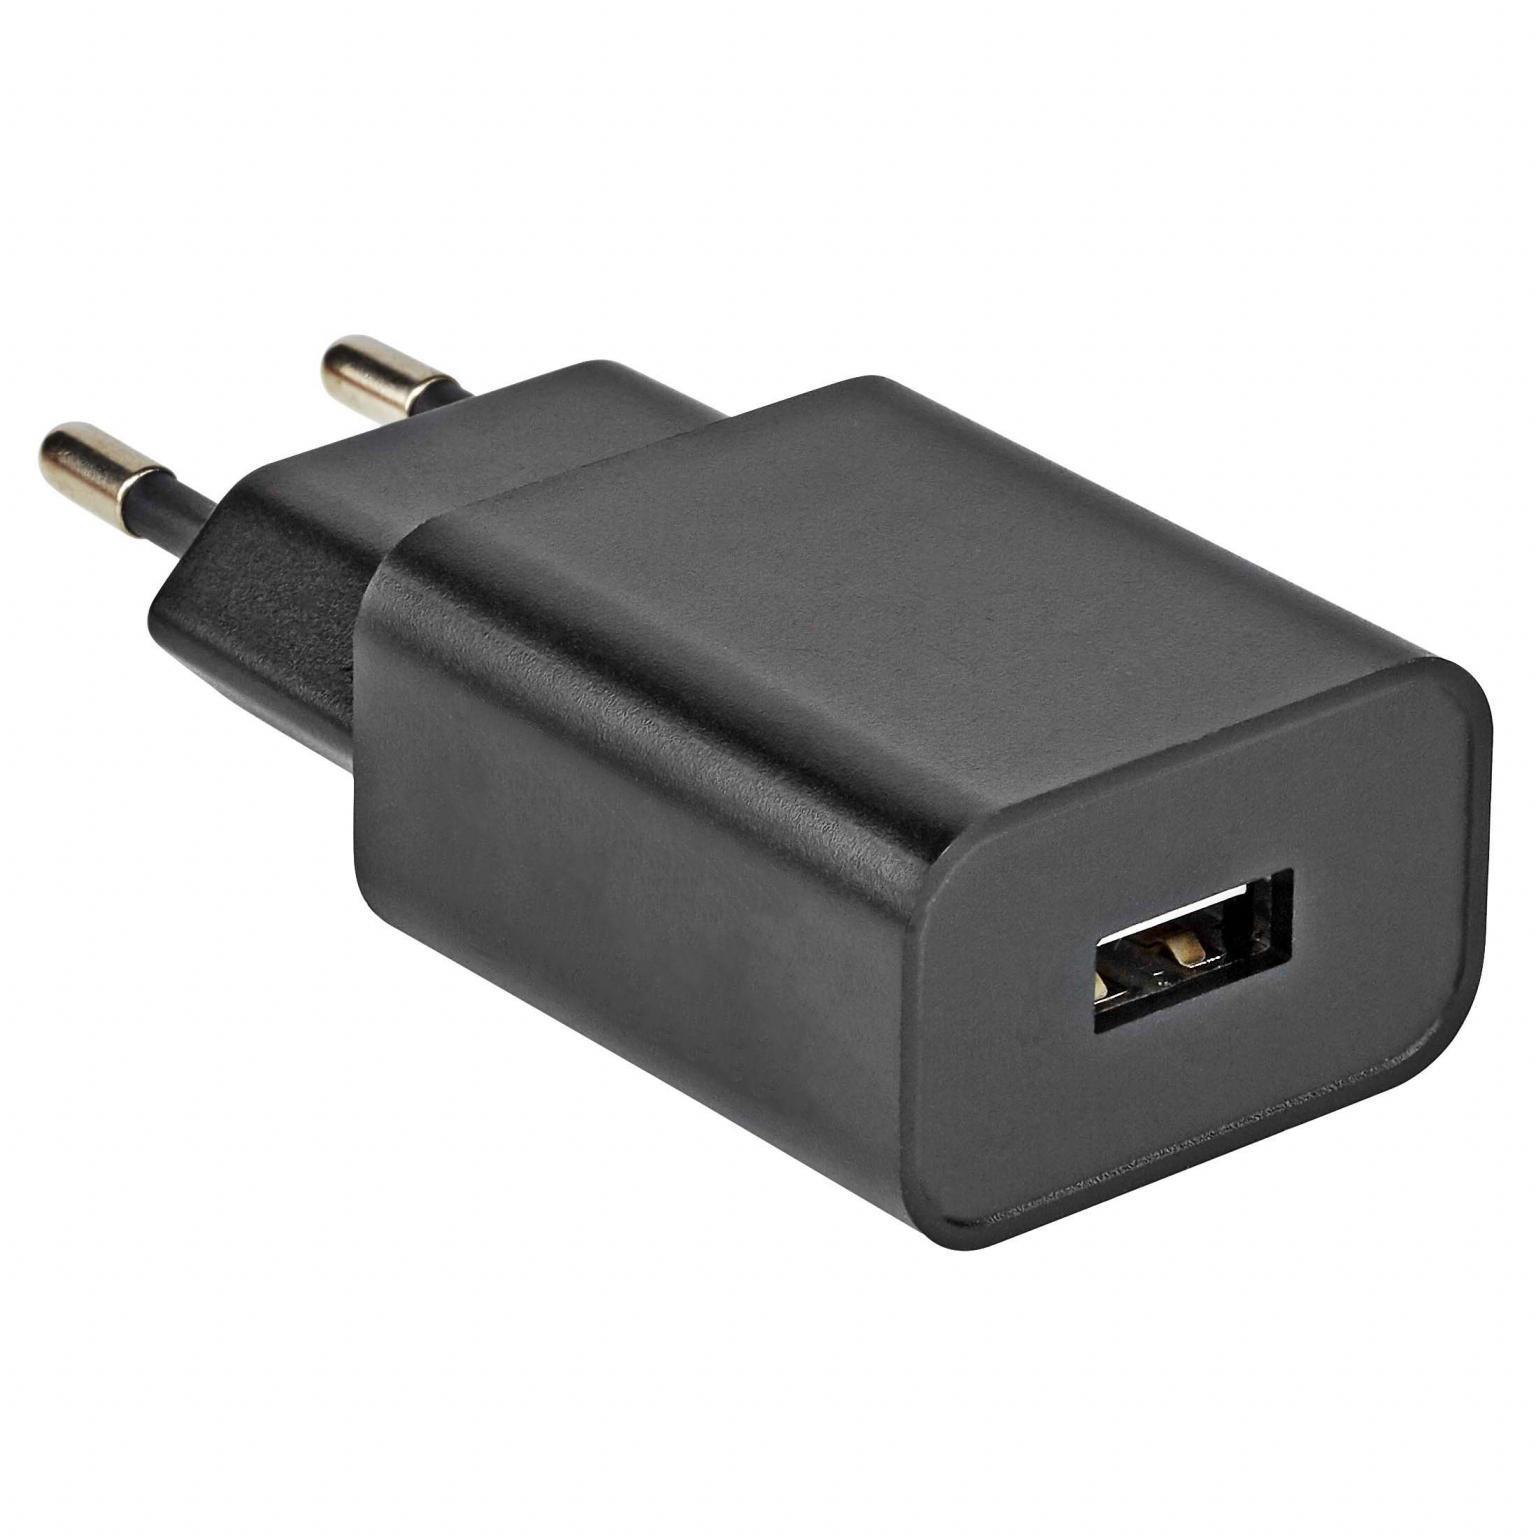 USB Lader - Zwart Uitgaande Stroom: 1000 mA